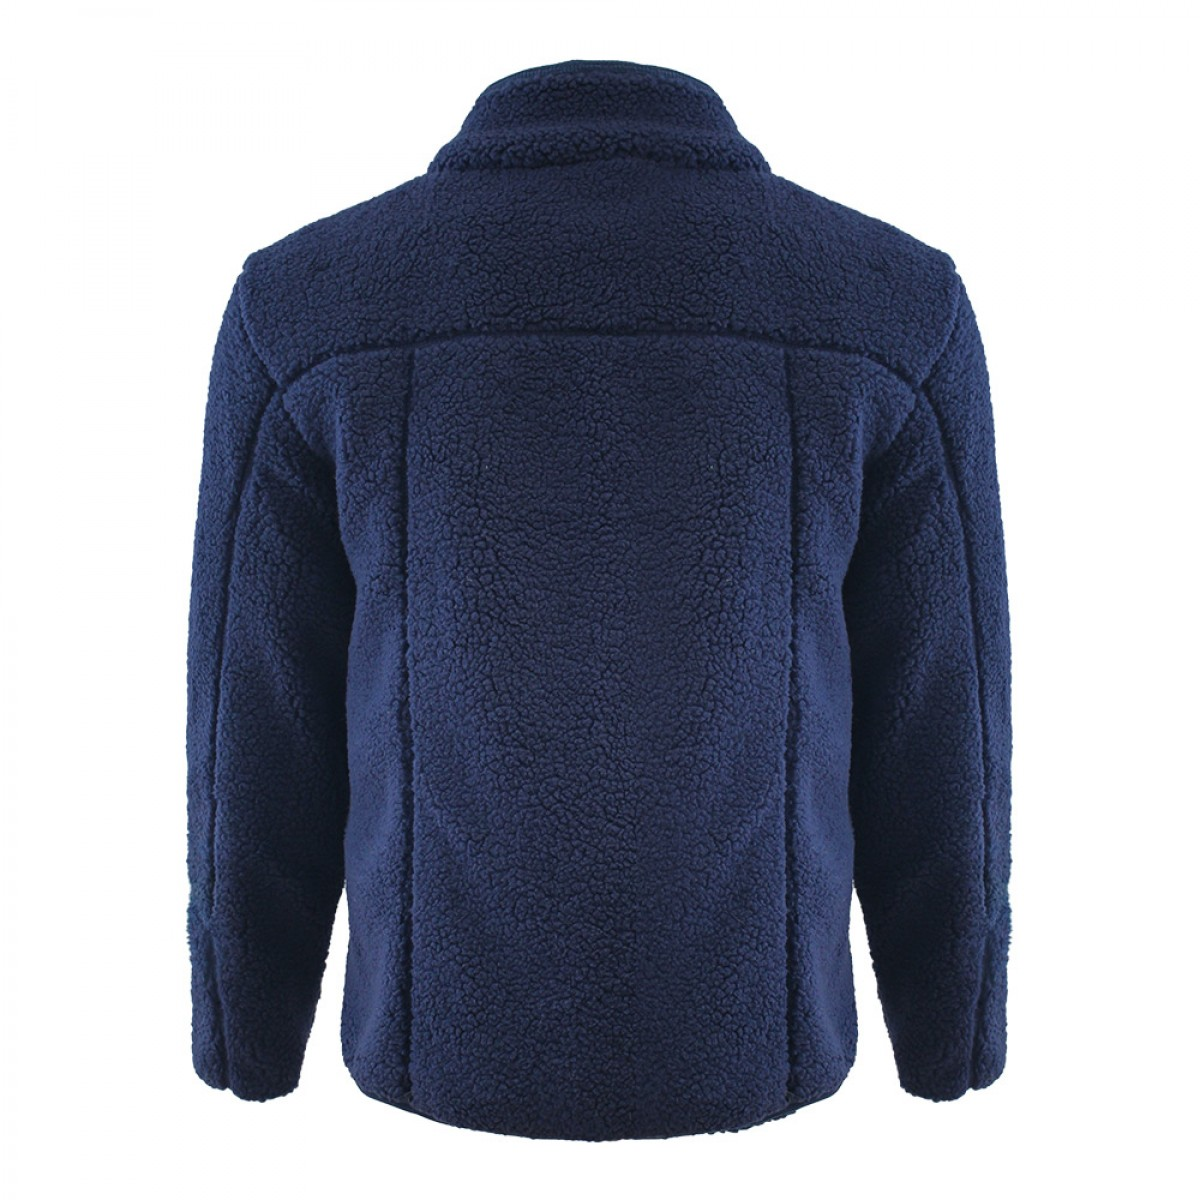 men-thick-sheep-jacketksj05922-5a